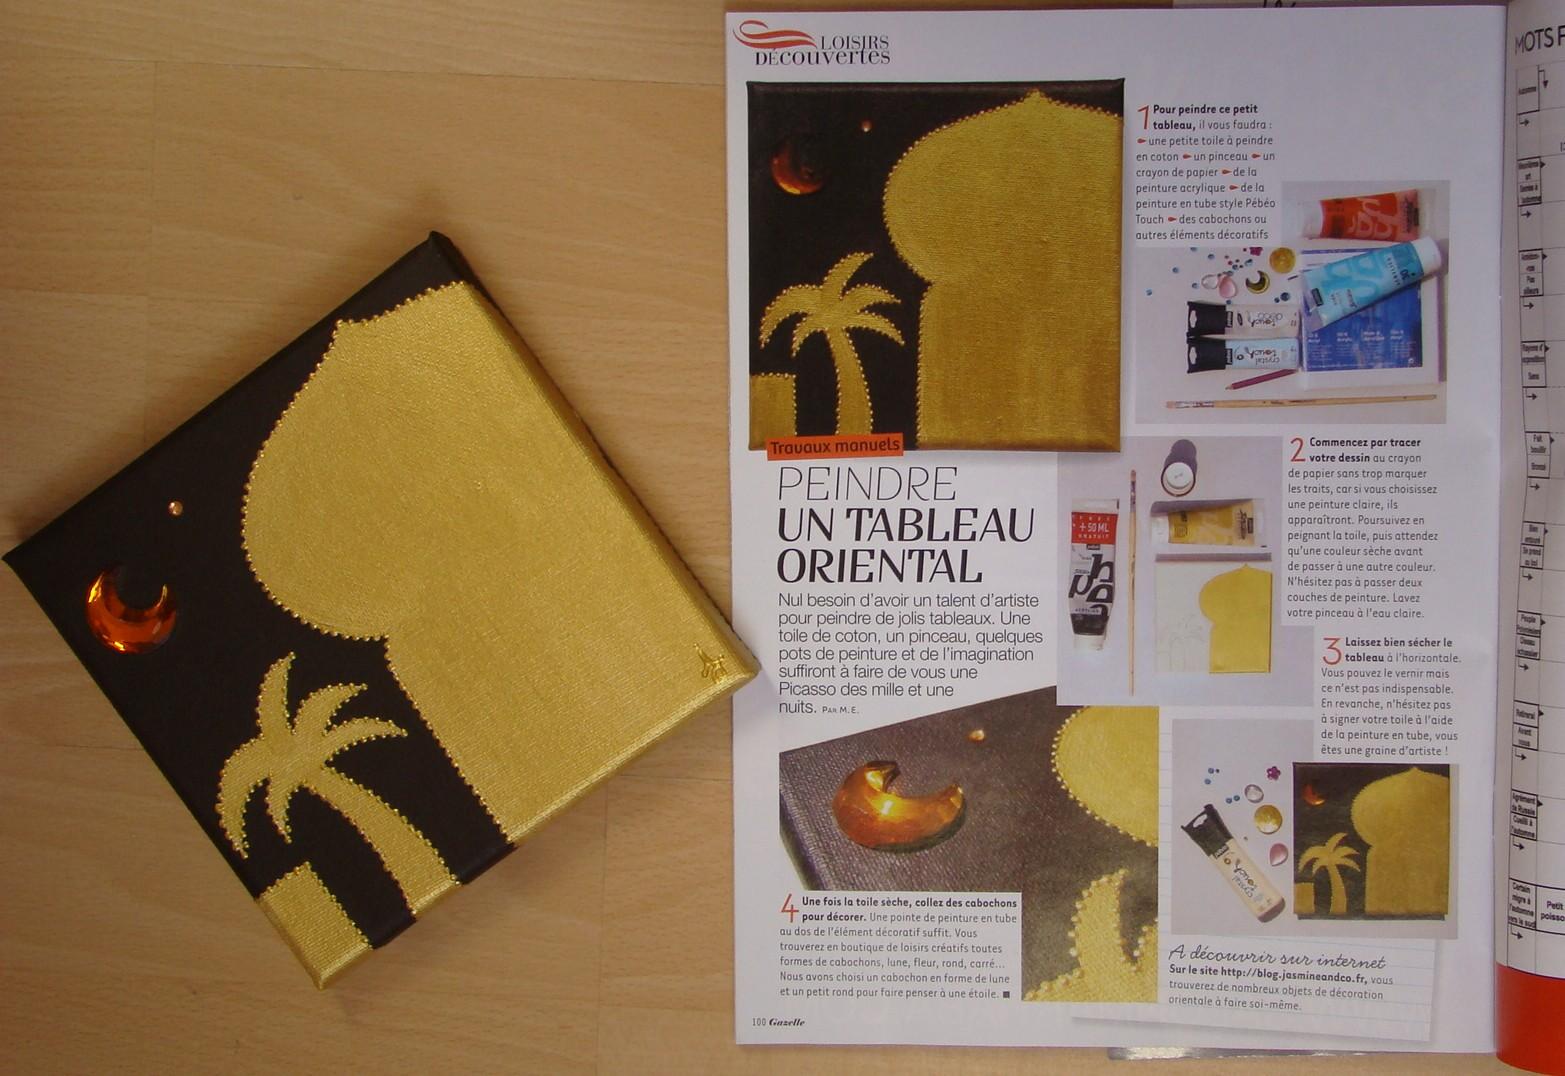 peindre un tableau oriental gazelle magazine jasmine. Black Bedroom Furniture Sets. Home Design Ideas